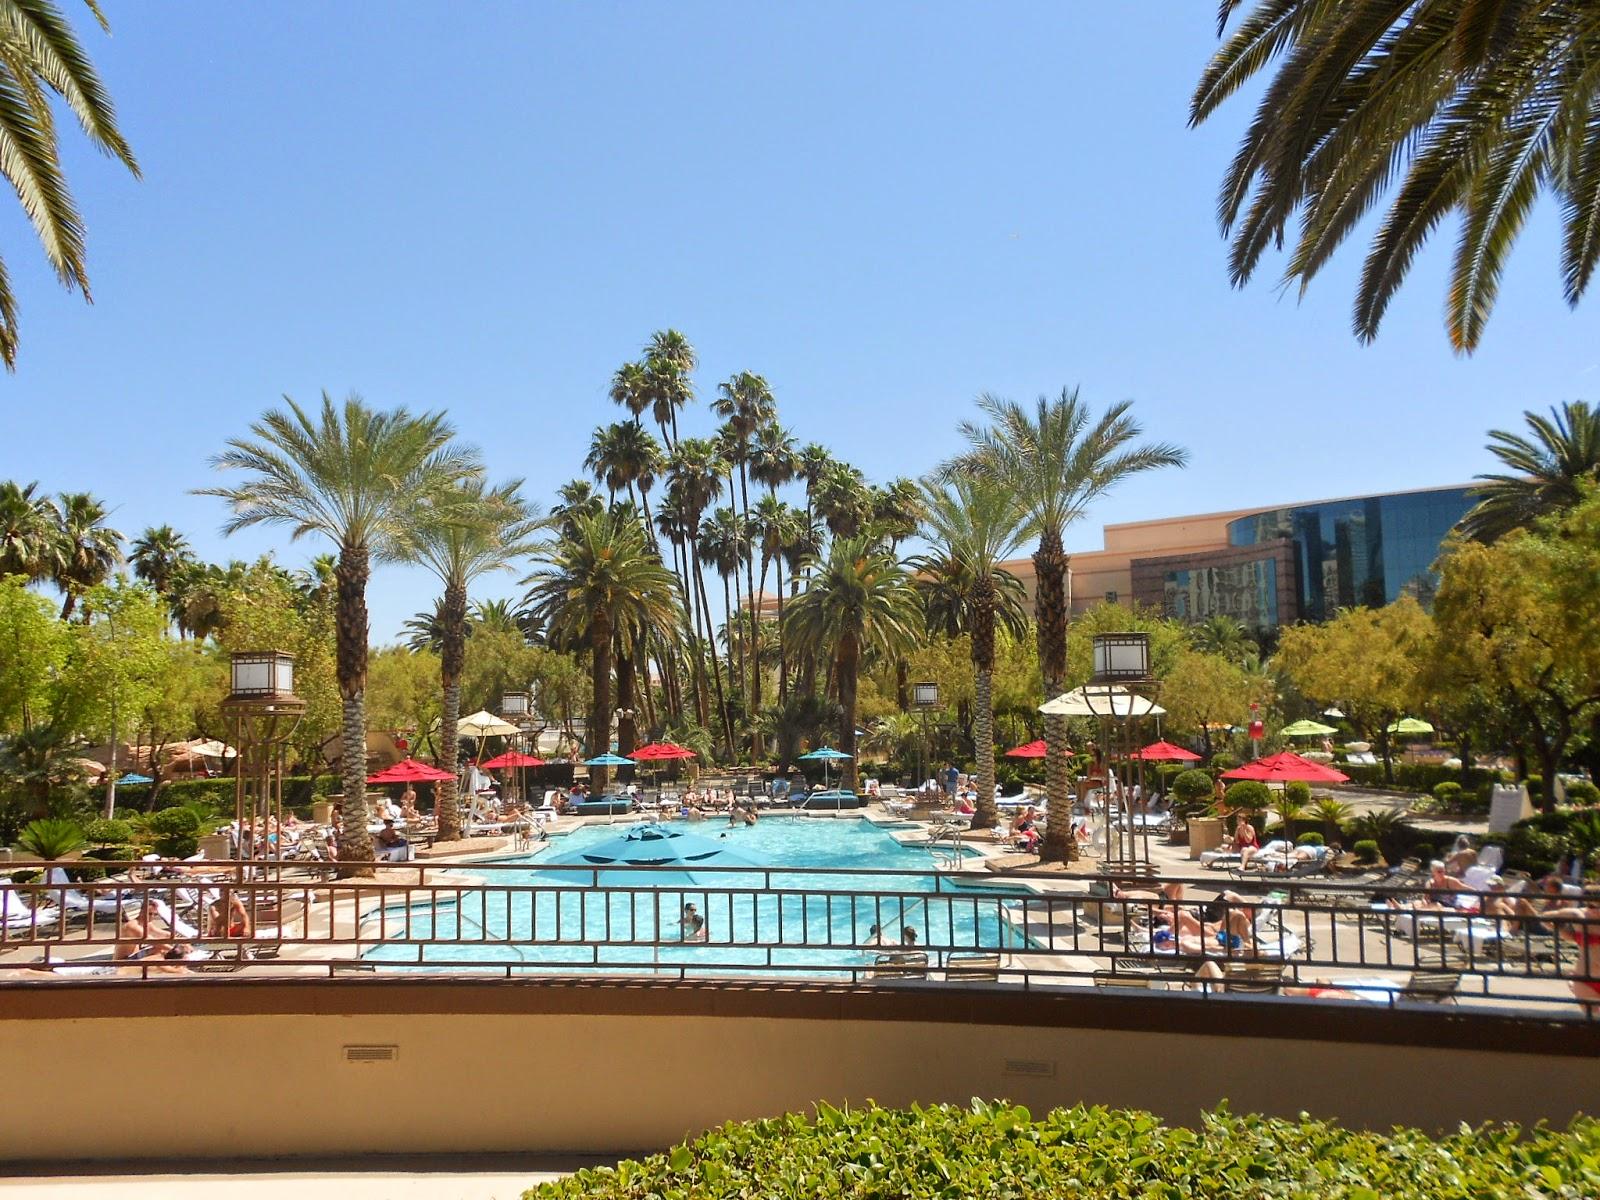 Piscina MGM - Las Vegas